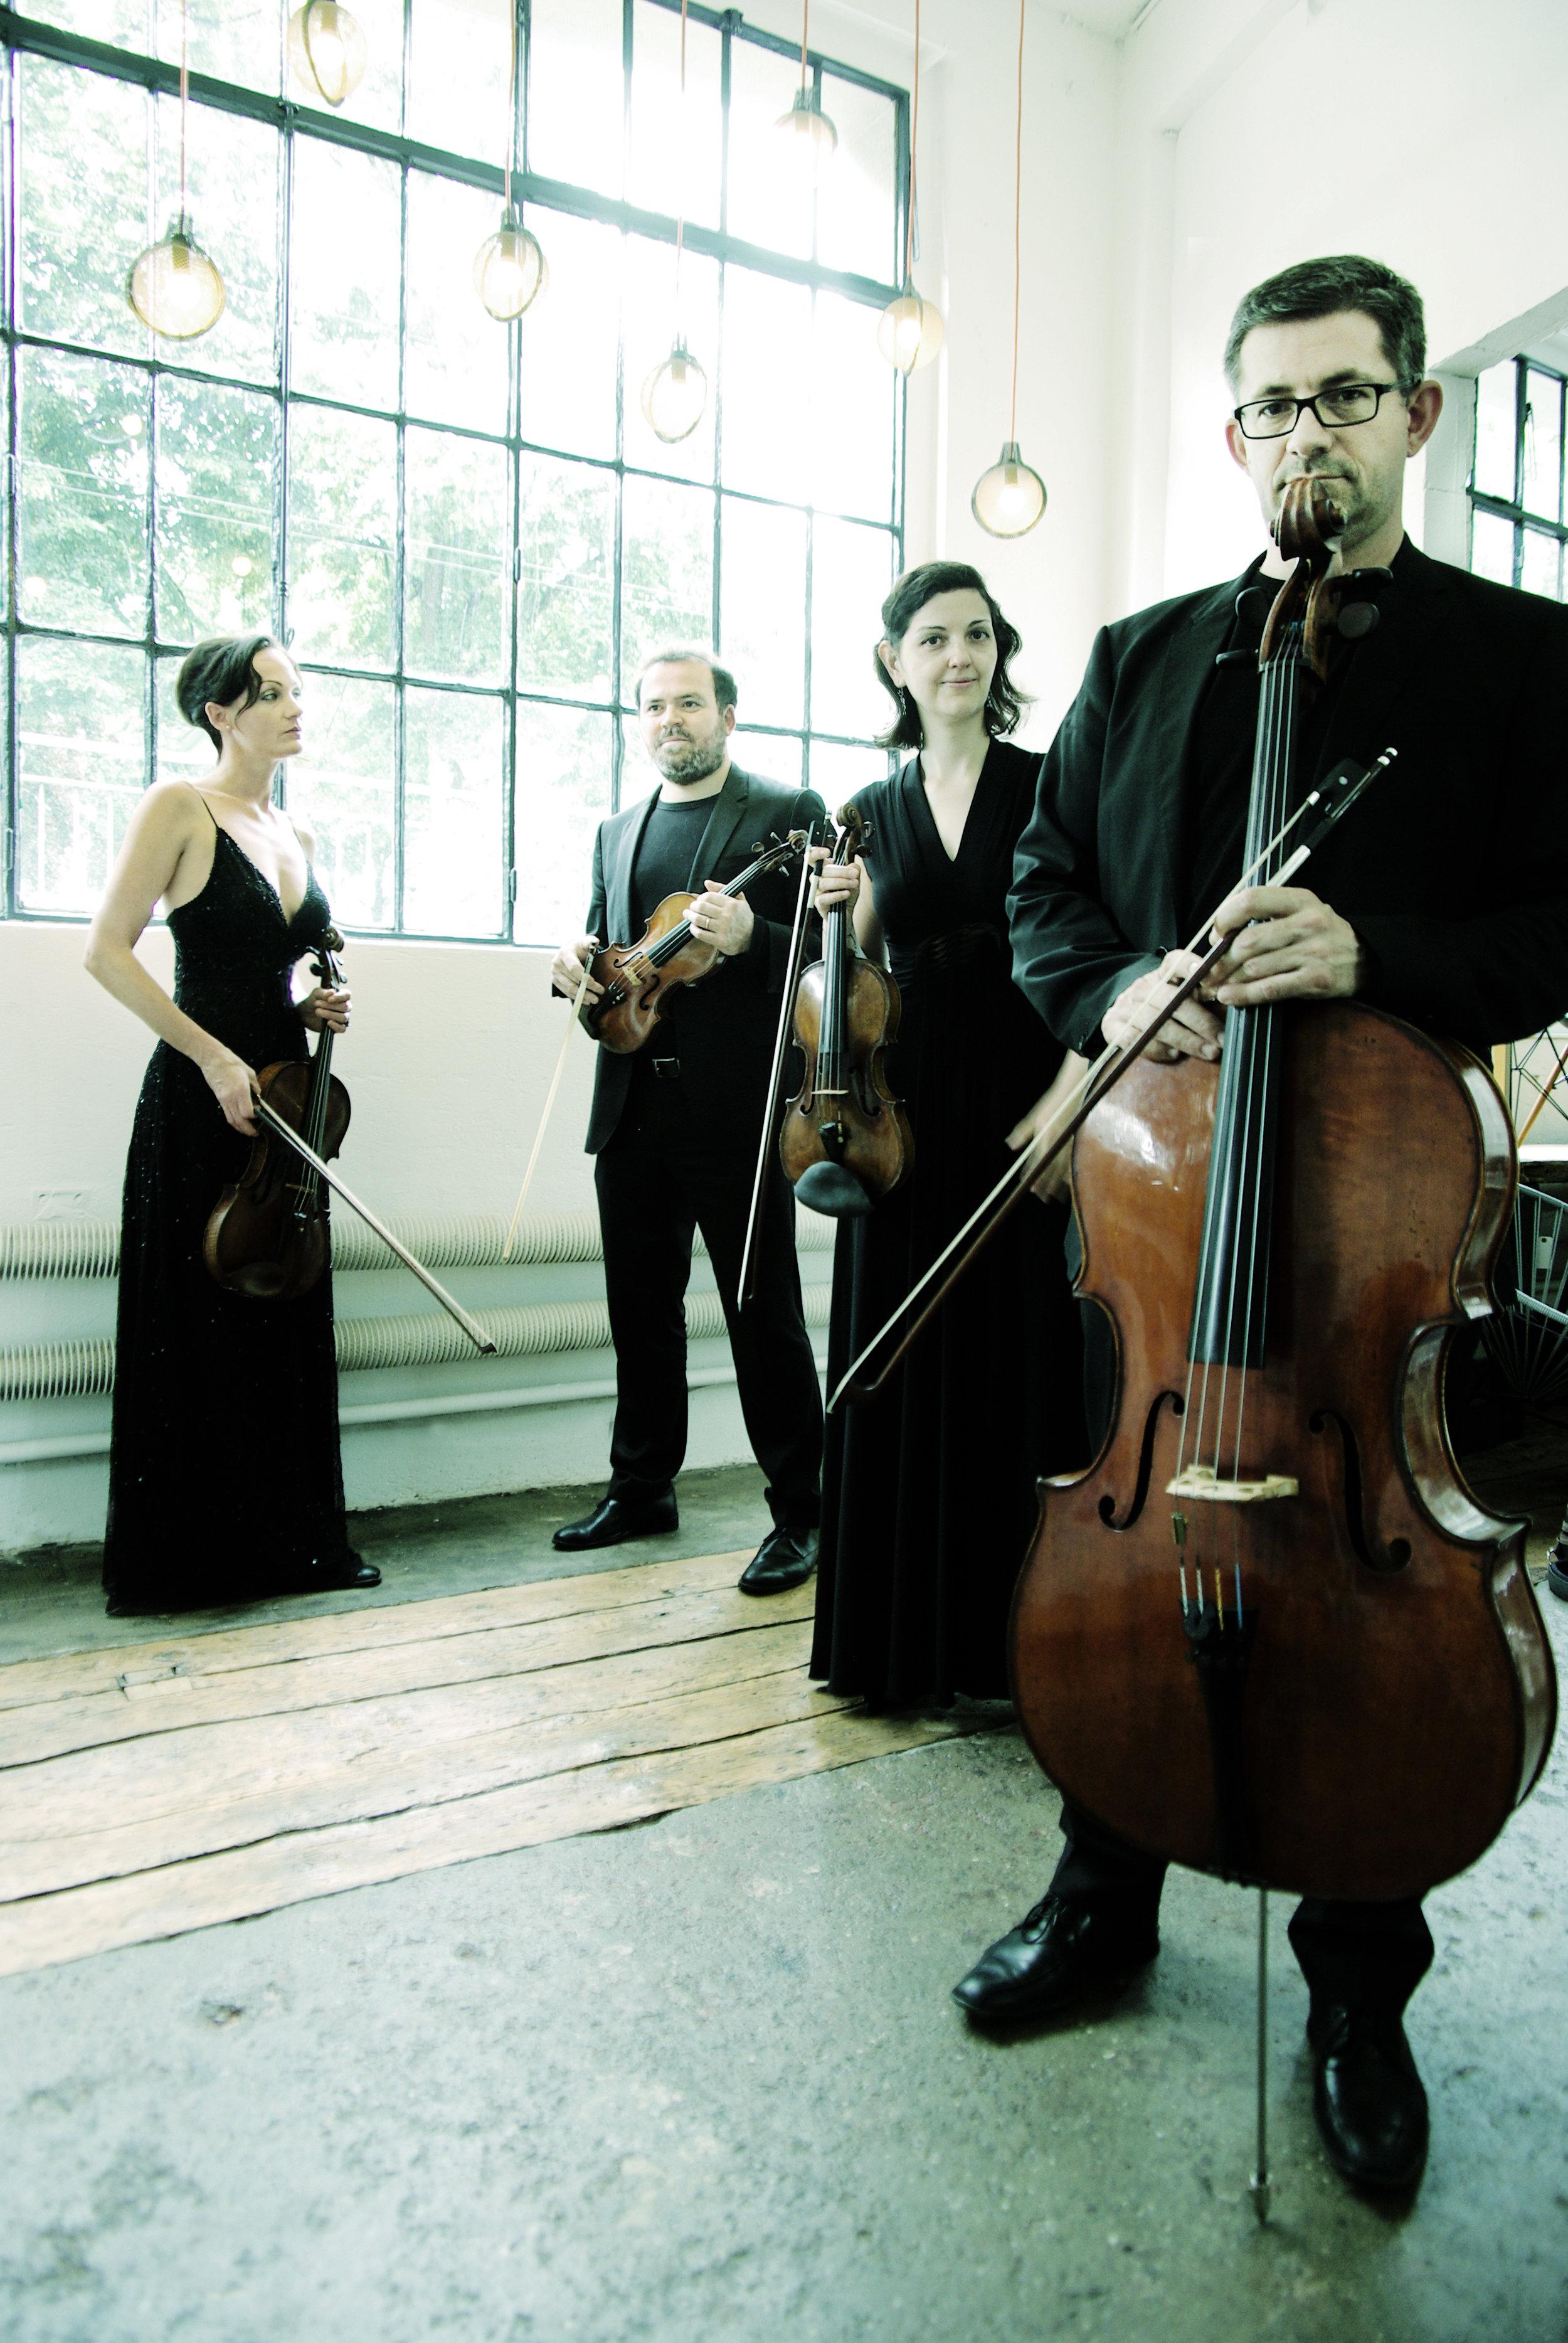 Carolina Cohen-Adad (Viola), Girolamo Bottiglieri (Primo violino), Raya Raytcheva (Secondo Violino), François Grin (Violoncello) © Patrick Bühler